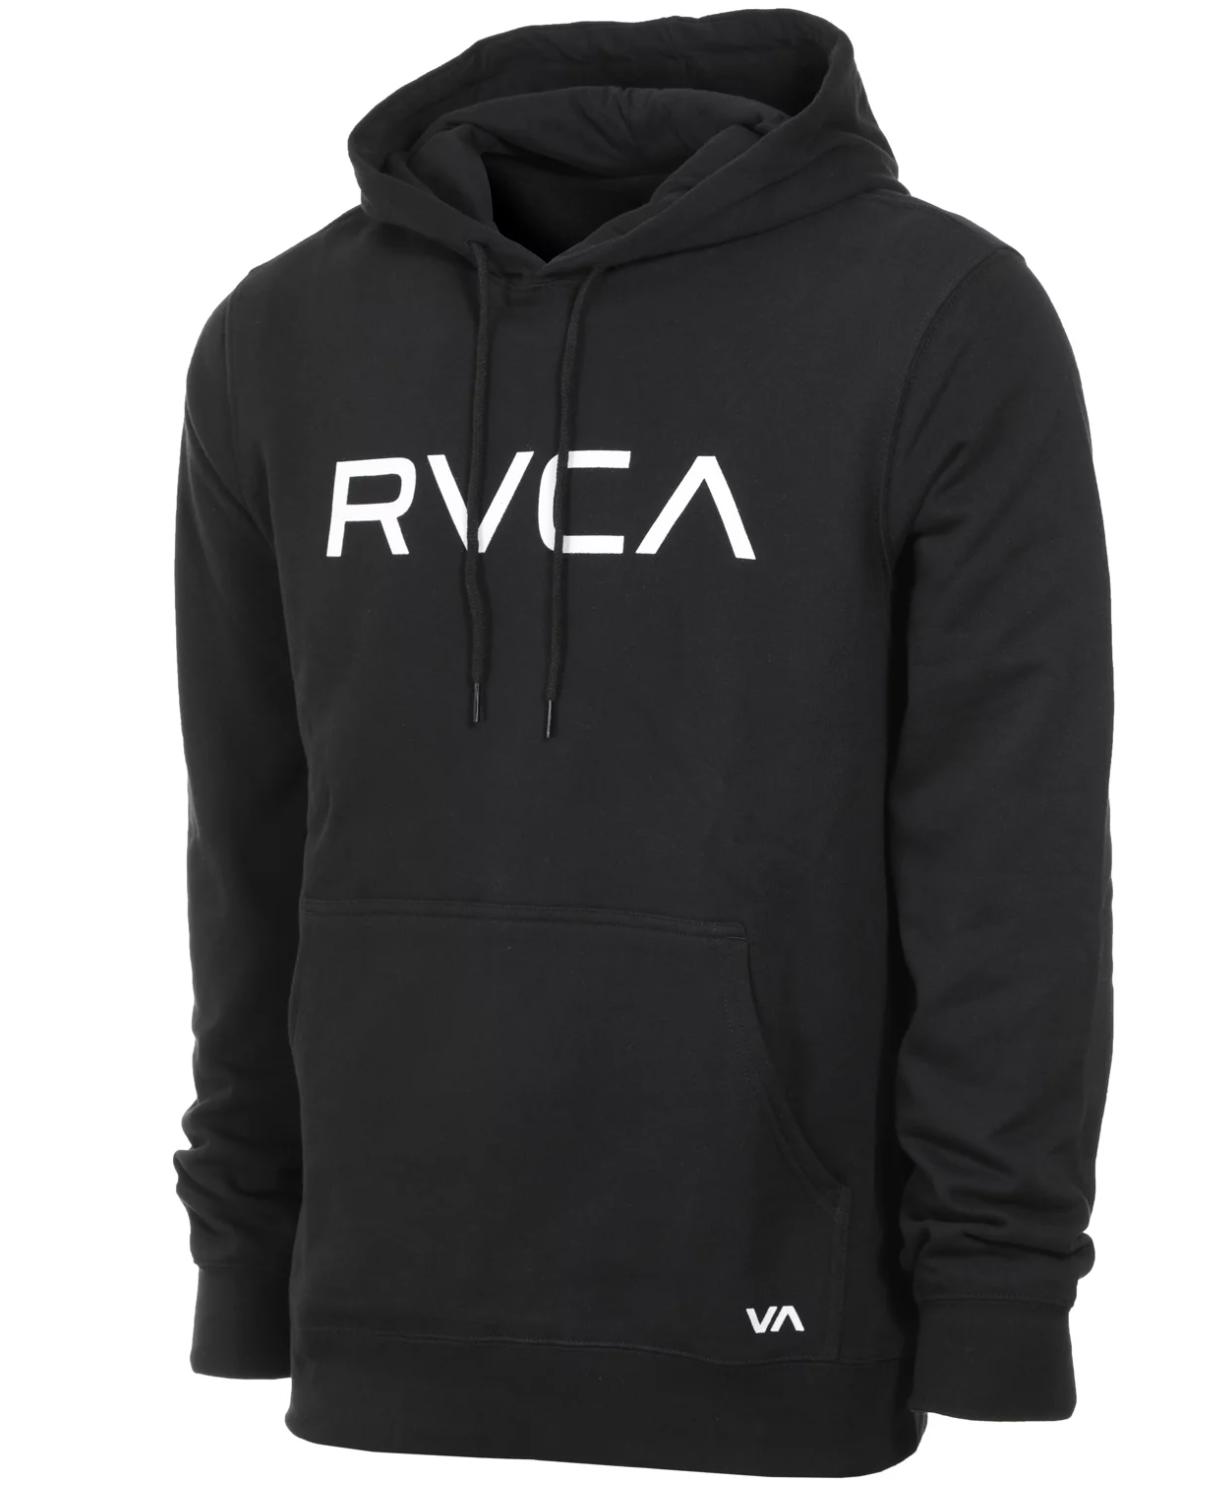 RVCA BIG HOODIE - BLACK